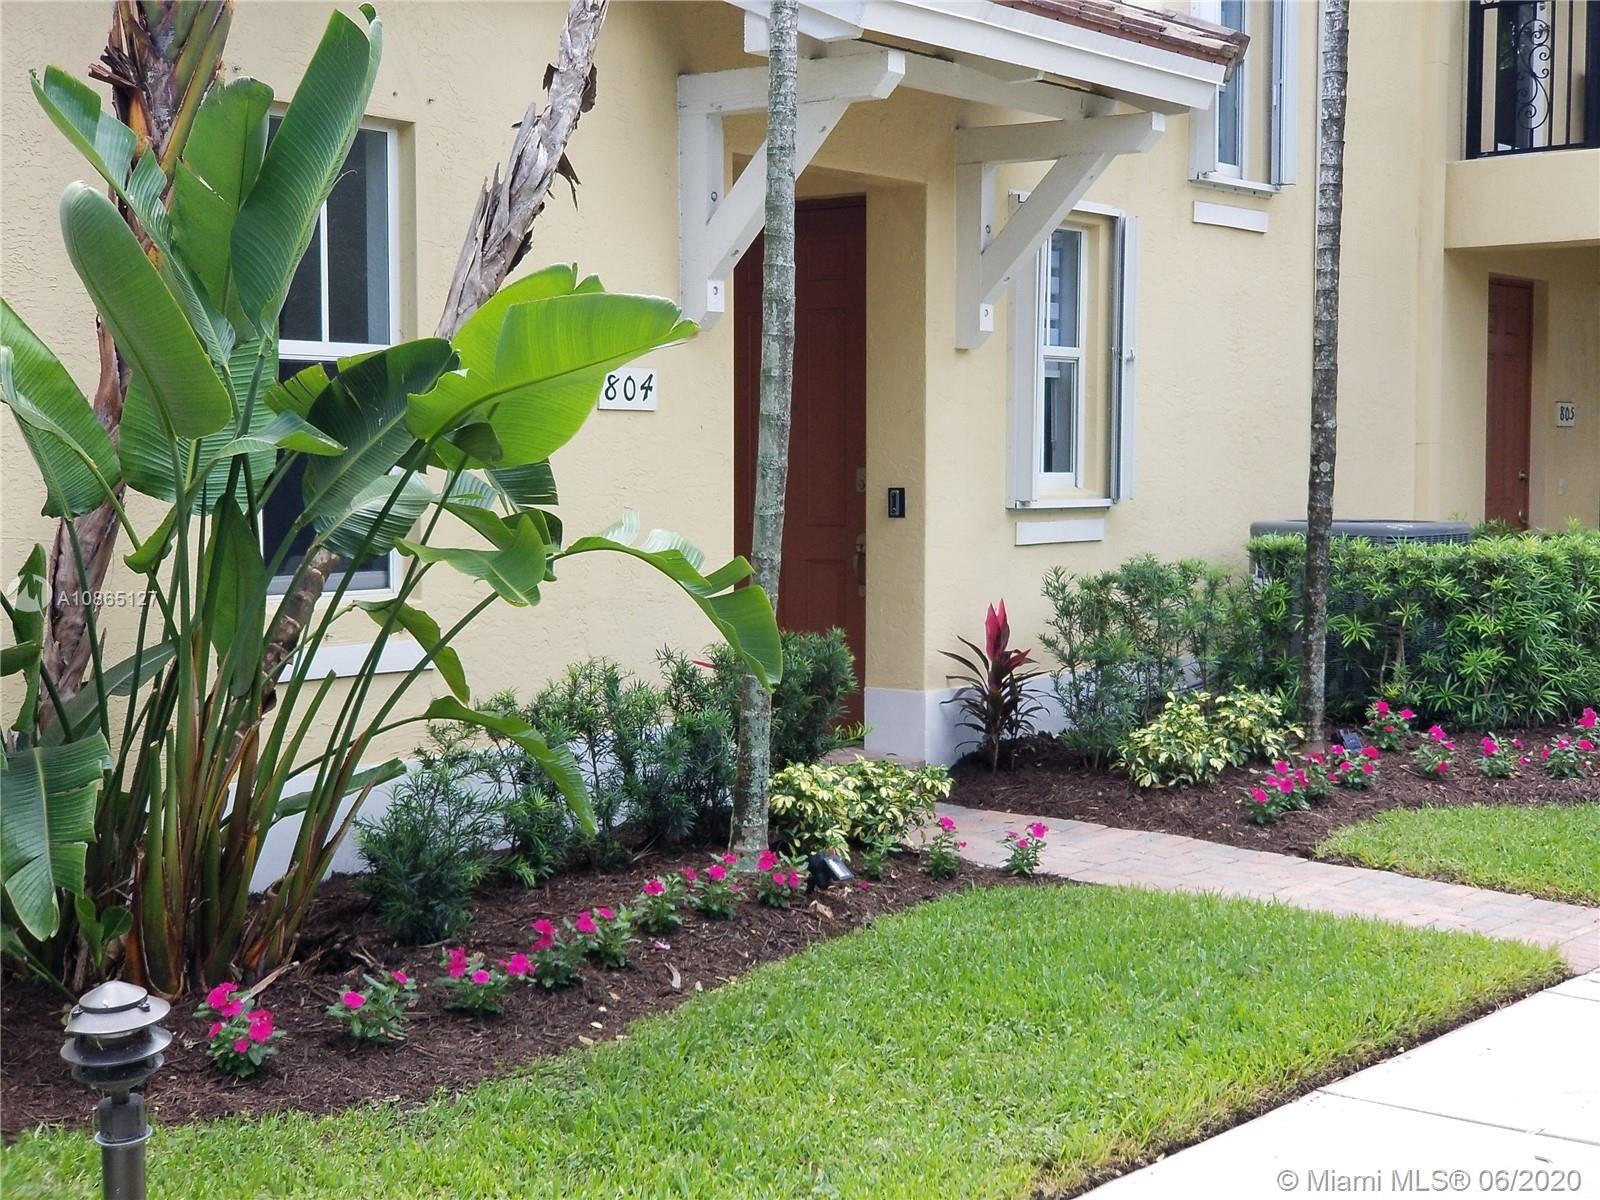 4680 Mimosa Pl #804, Coconut Creek, FL 33073 - #: A10865127